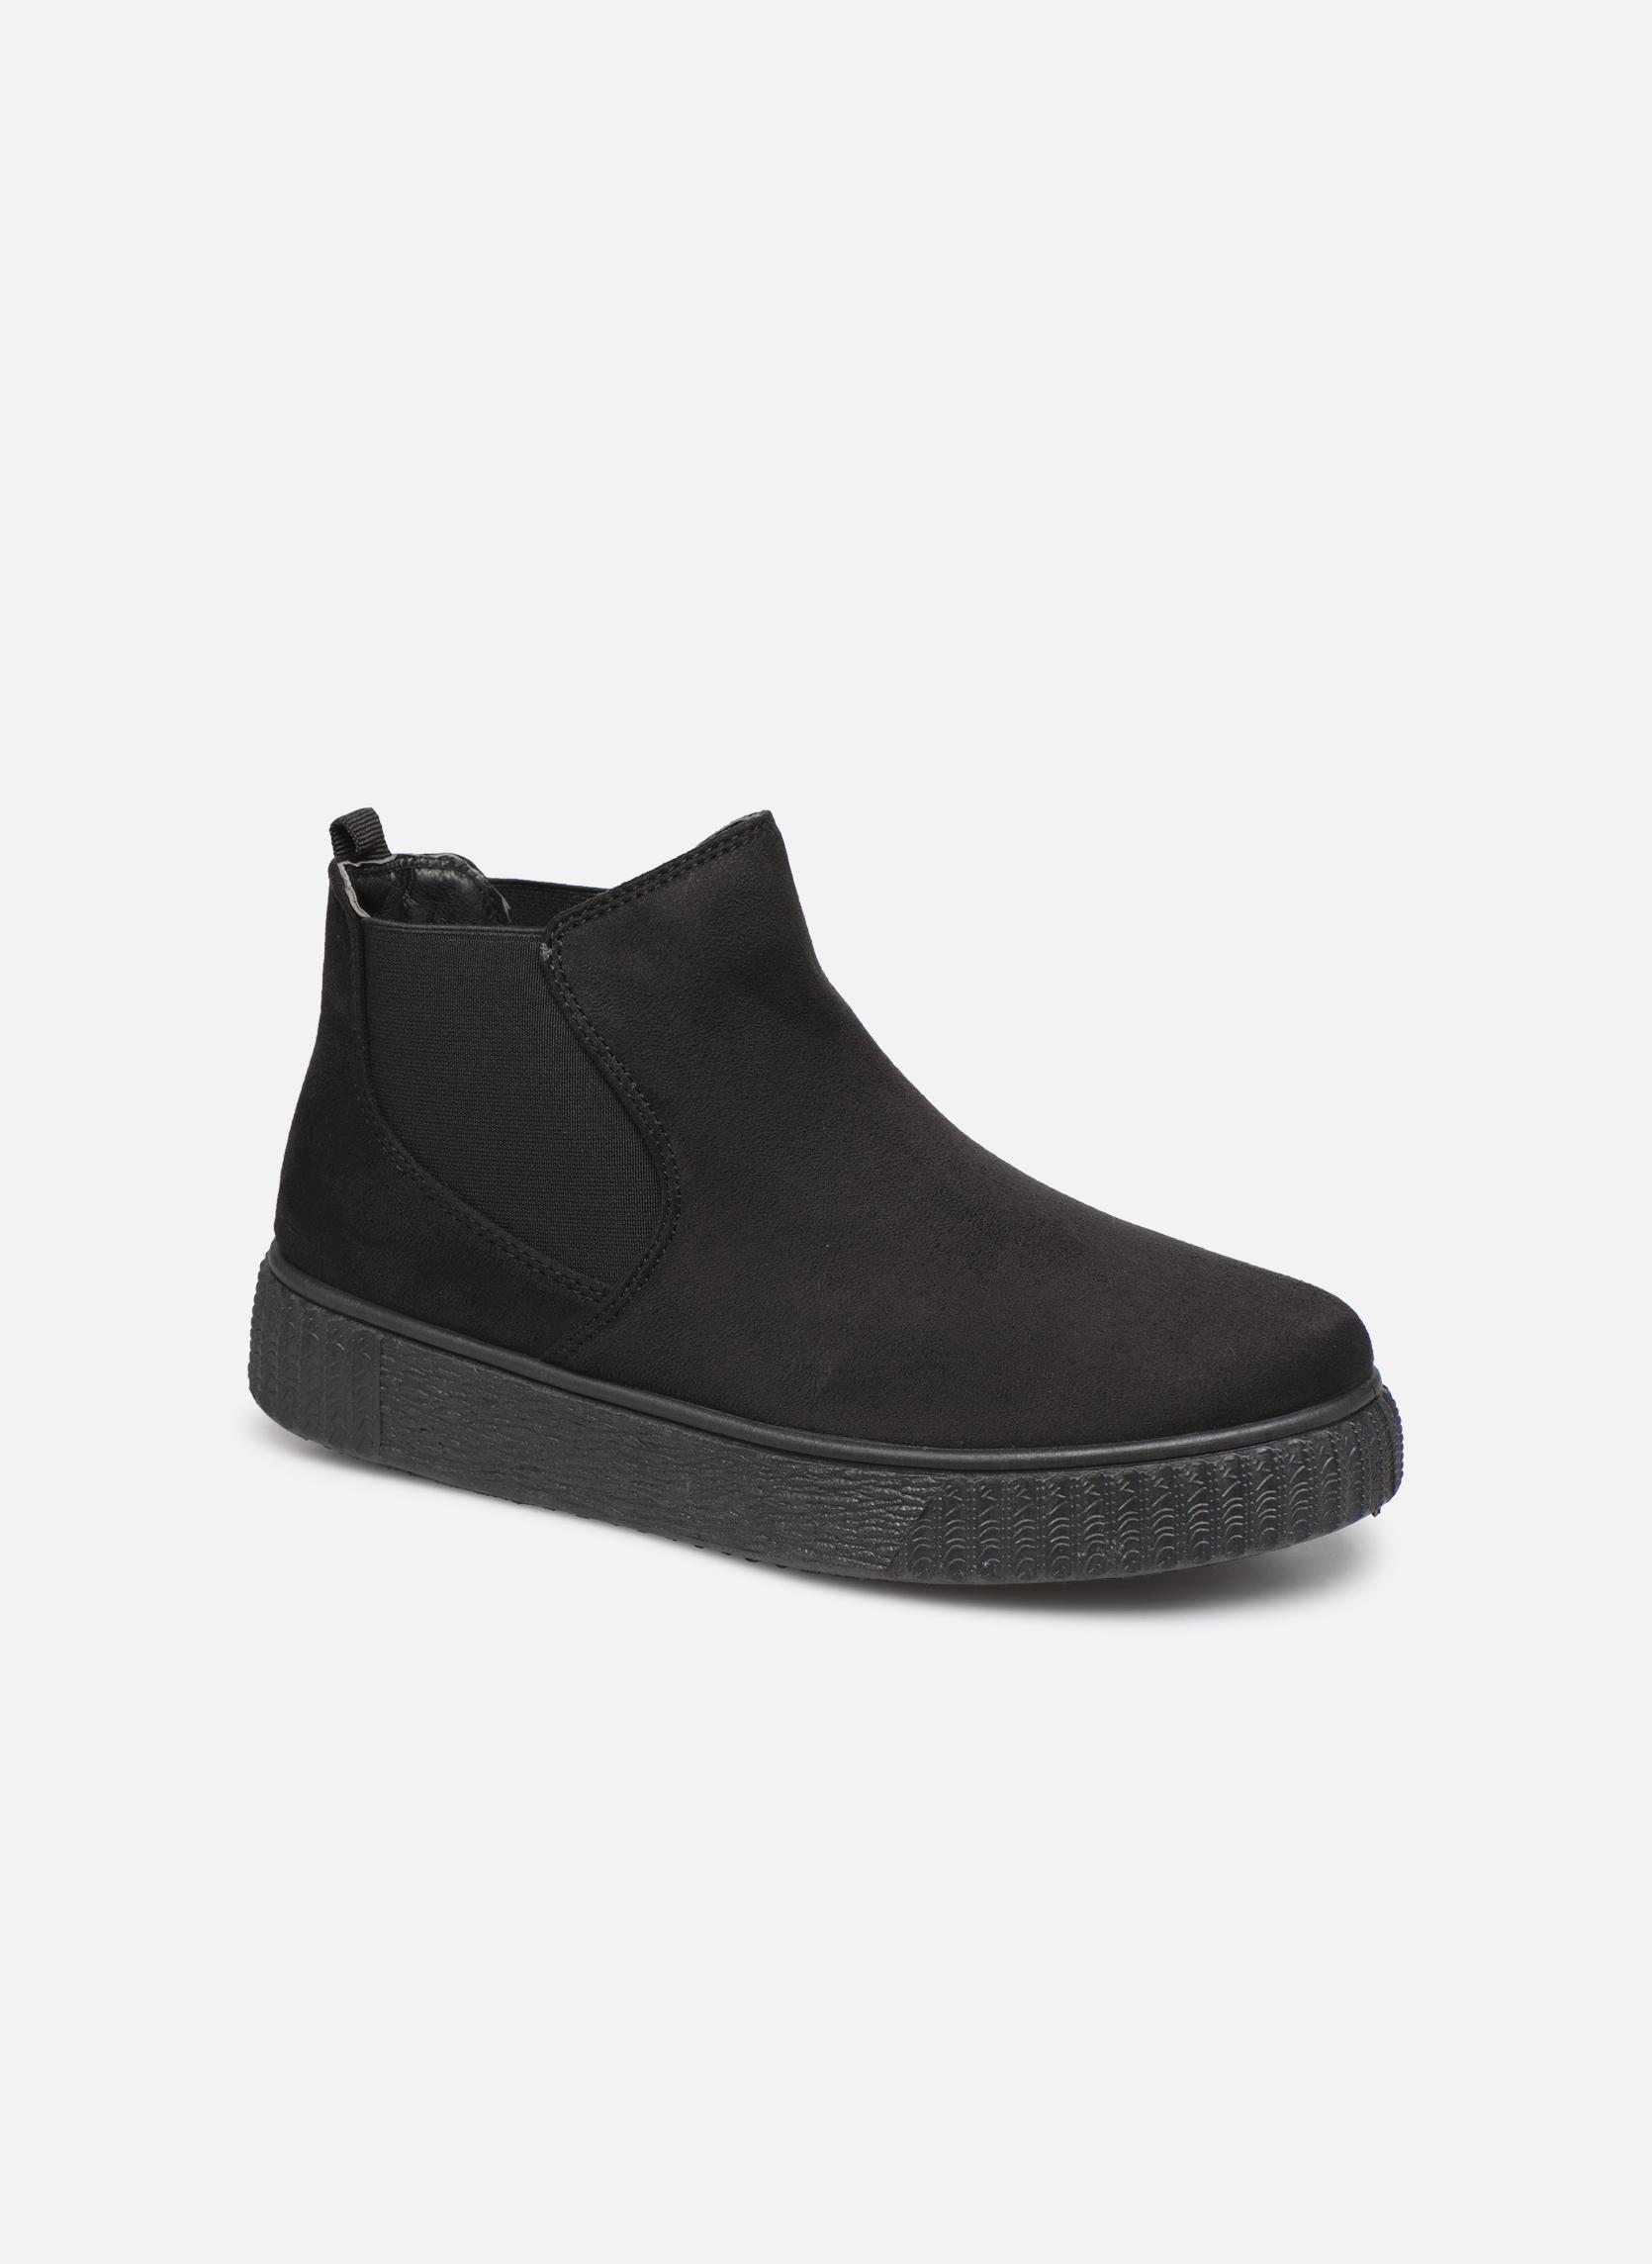 Grandes descuentos (Negro) últimos zapatos Les P'tites Bombes Annabelle (Negro) descuentos - Deportivas Descuento 1d38b0